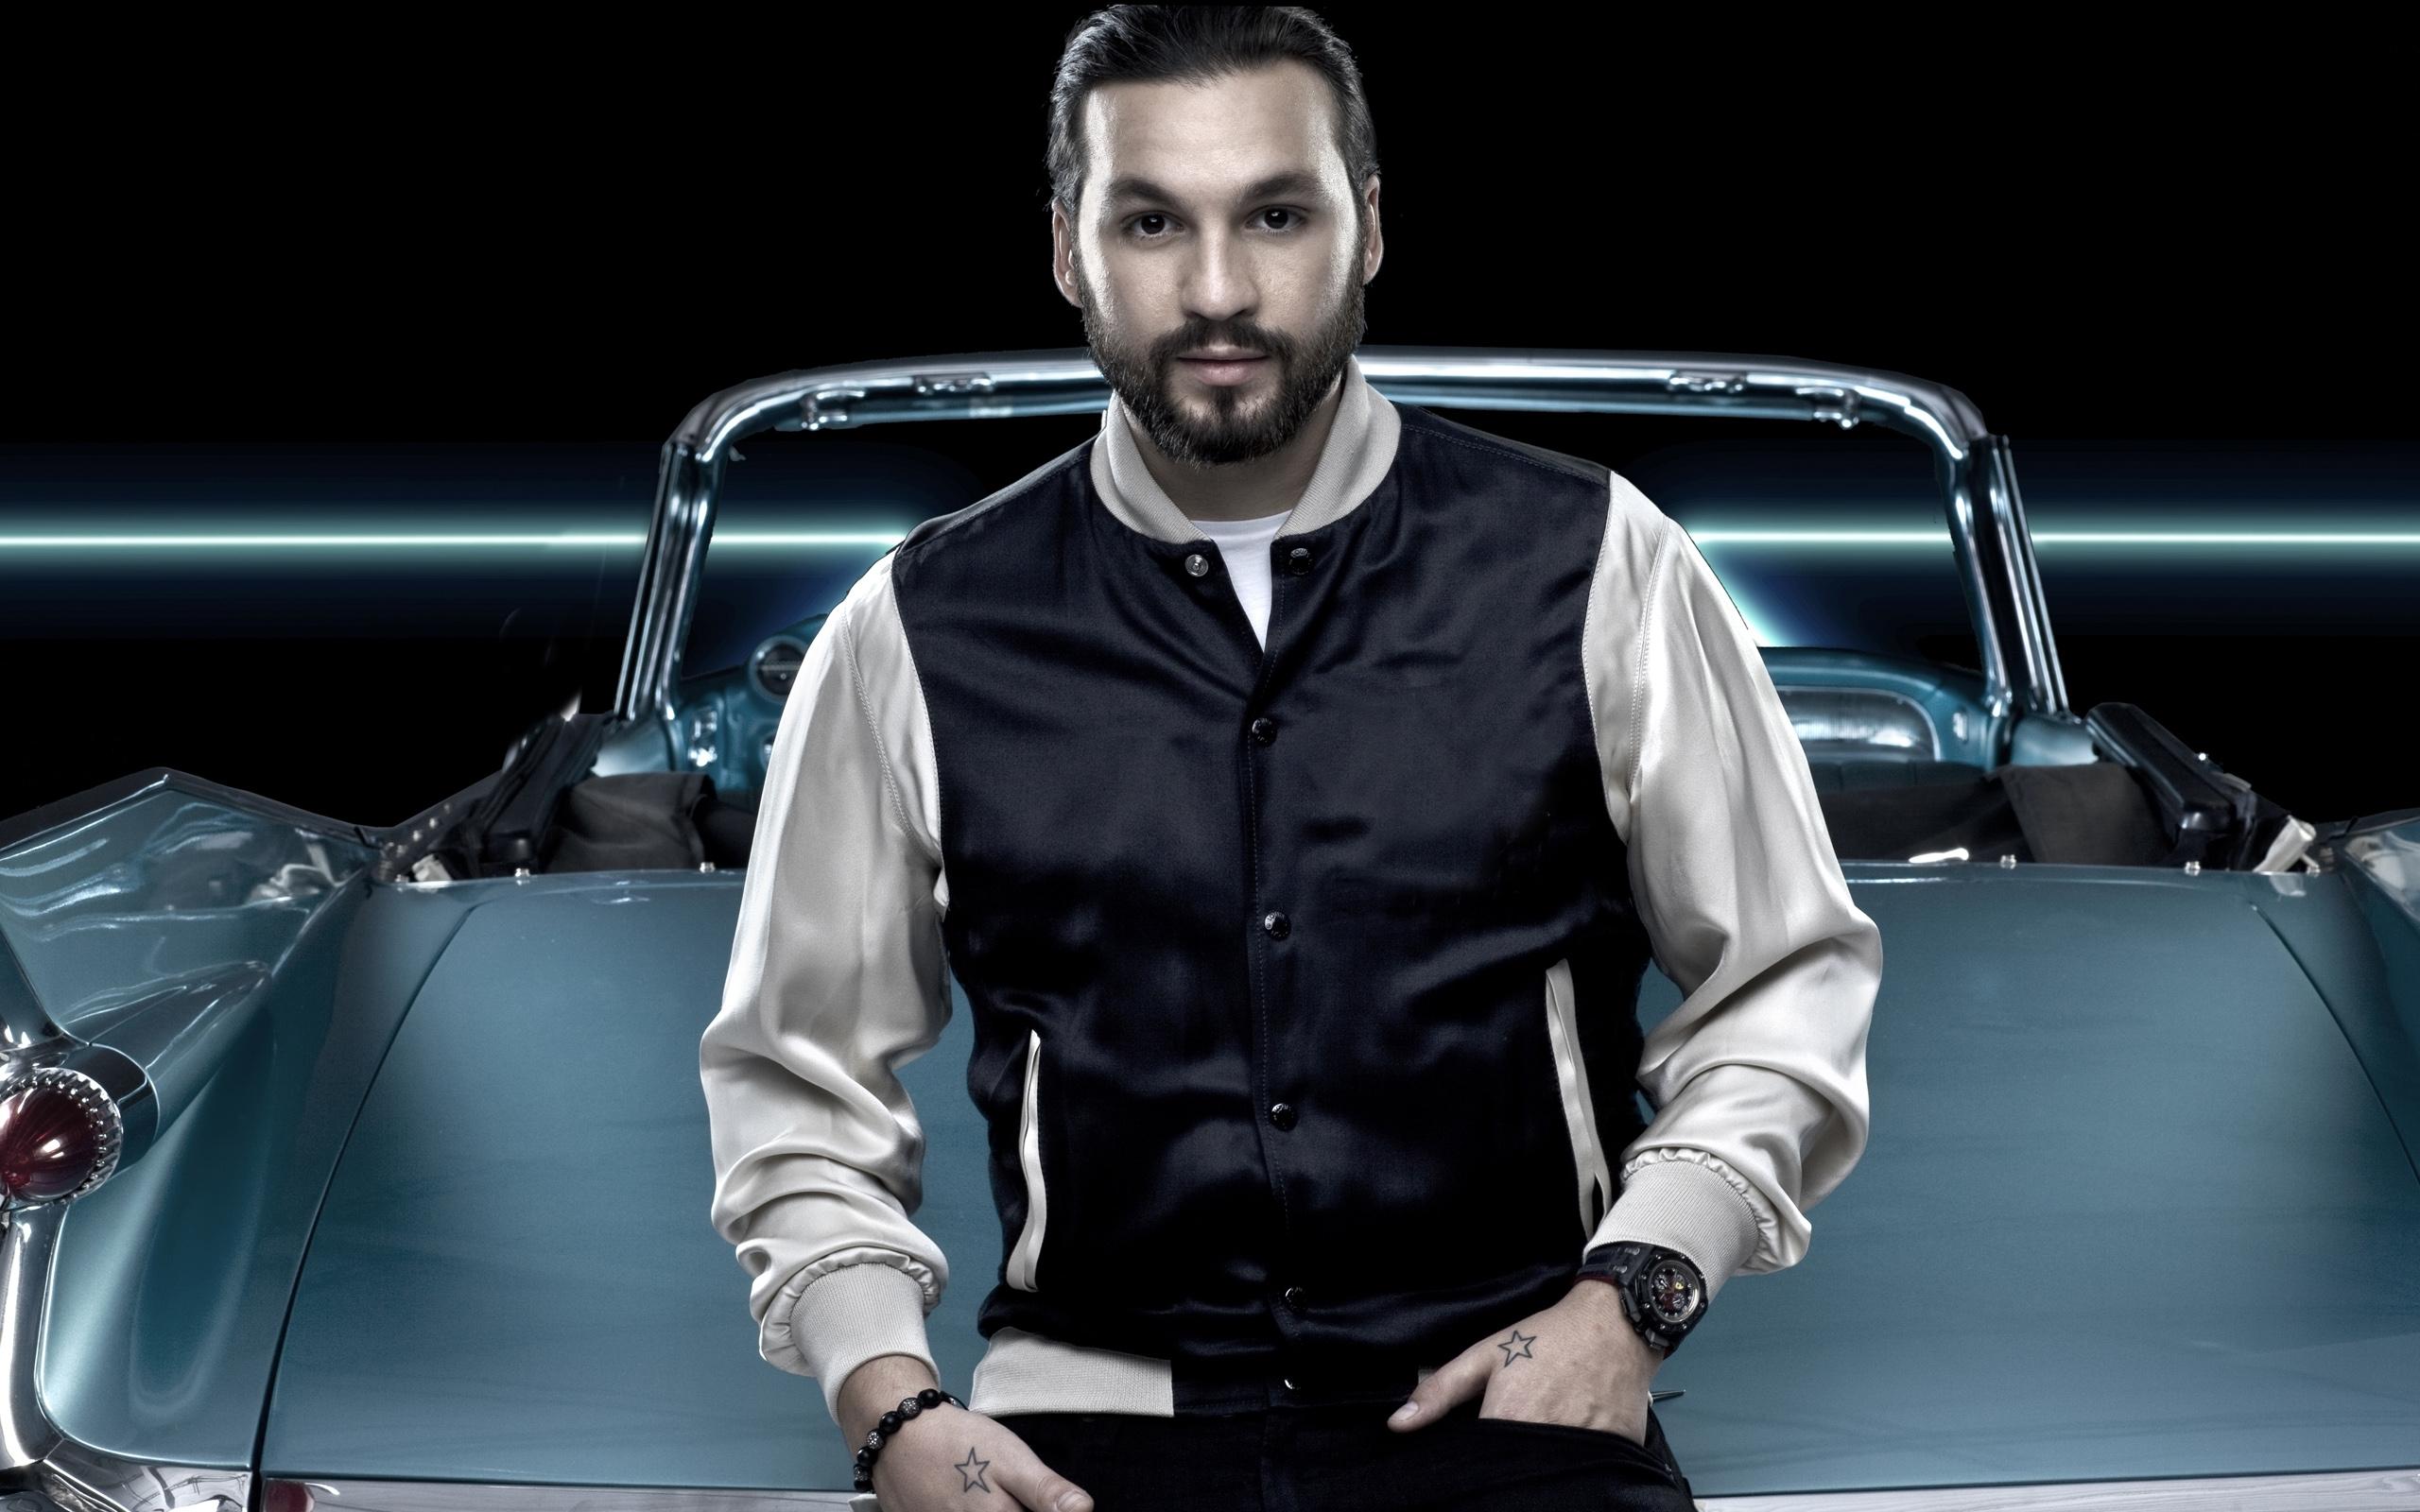 Model Car Vehicle Gentleman Fashion DJ Leather Steve Angello Photo Shoot